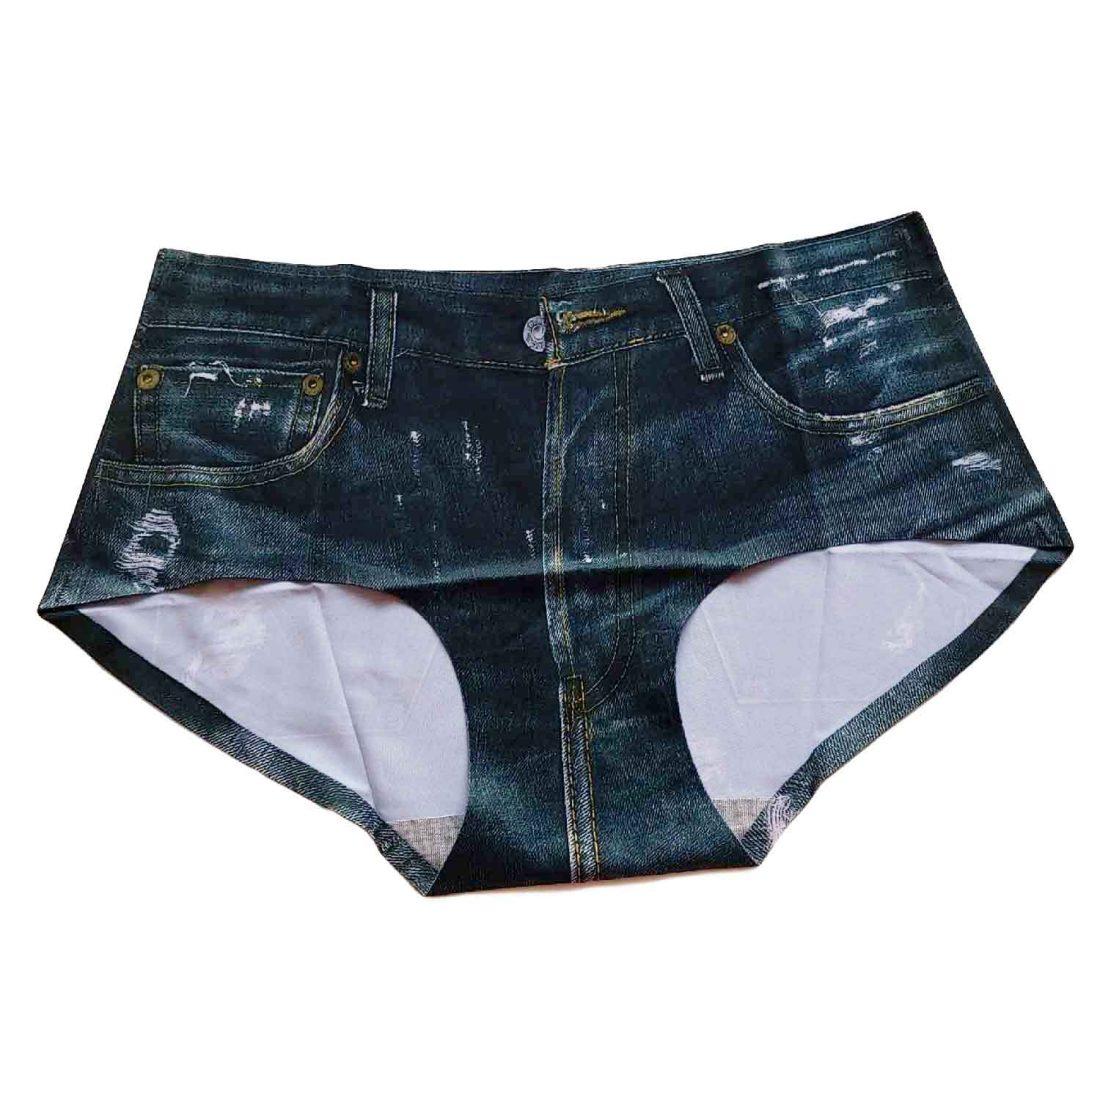 M0277 black1 Panties Slips Underwear Shapewear maureens.com boutique